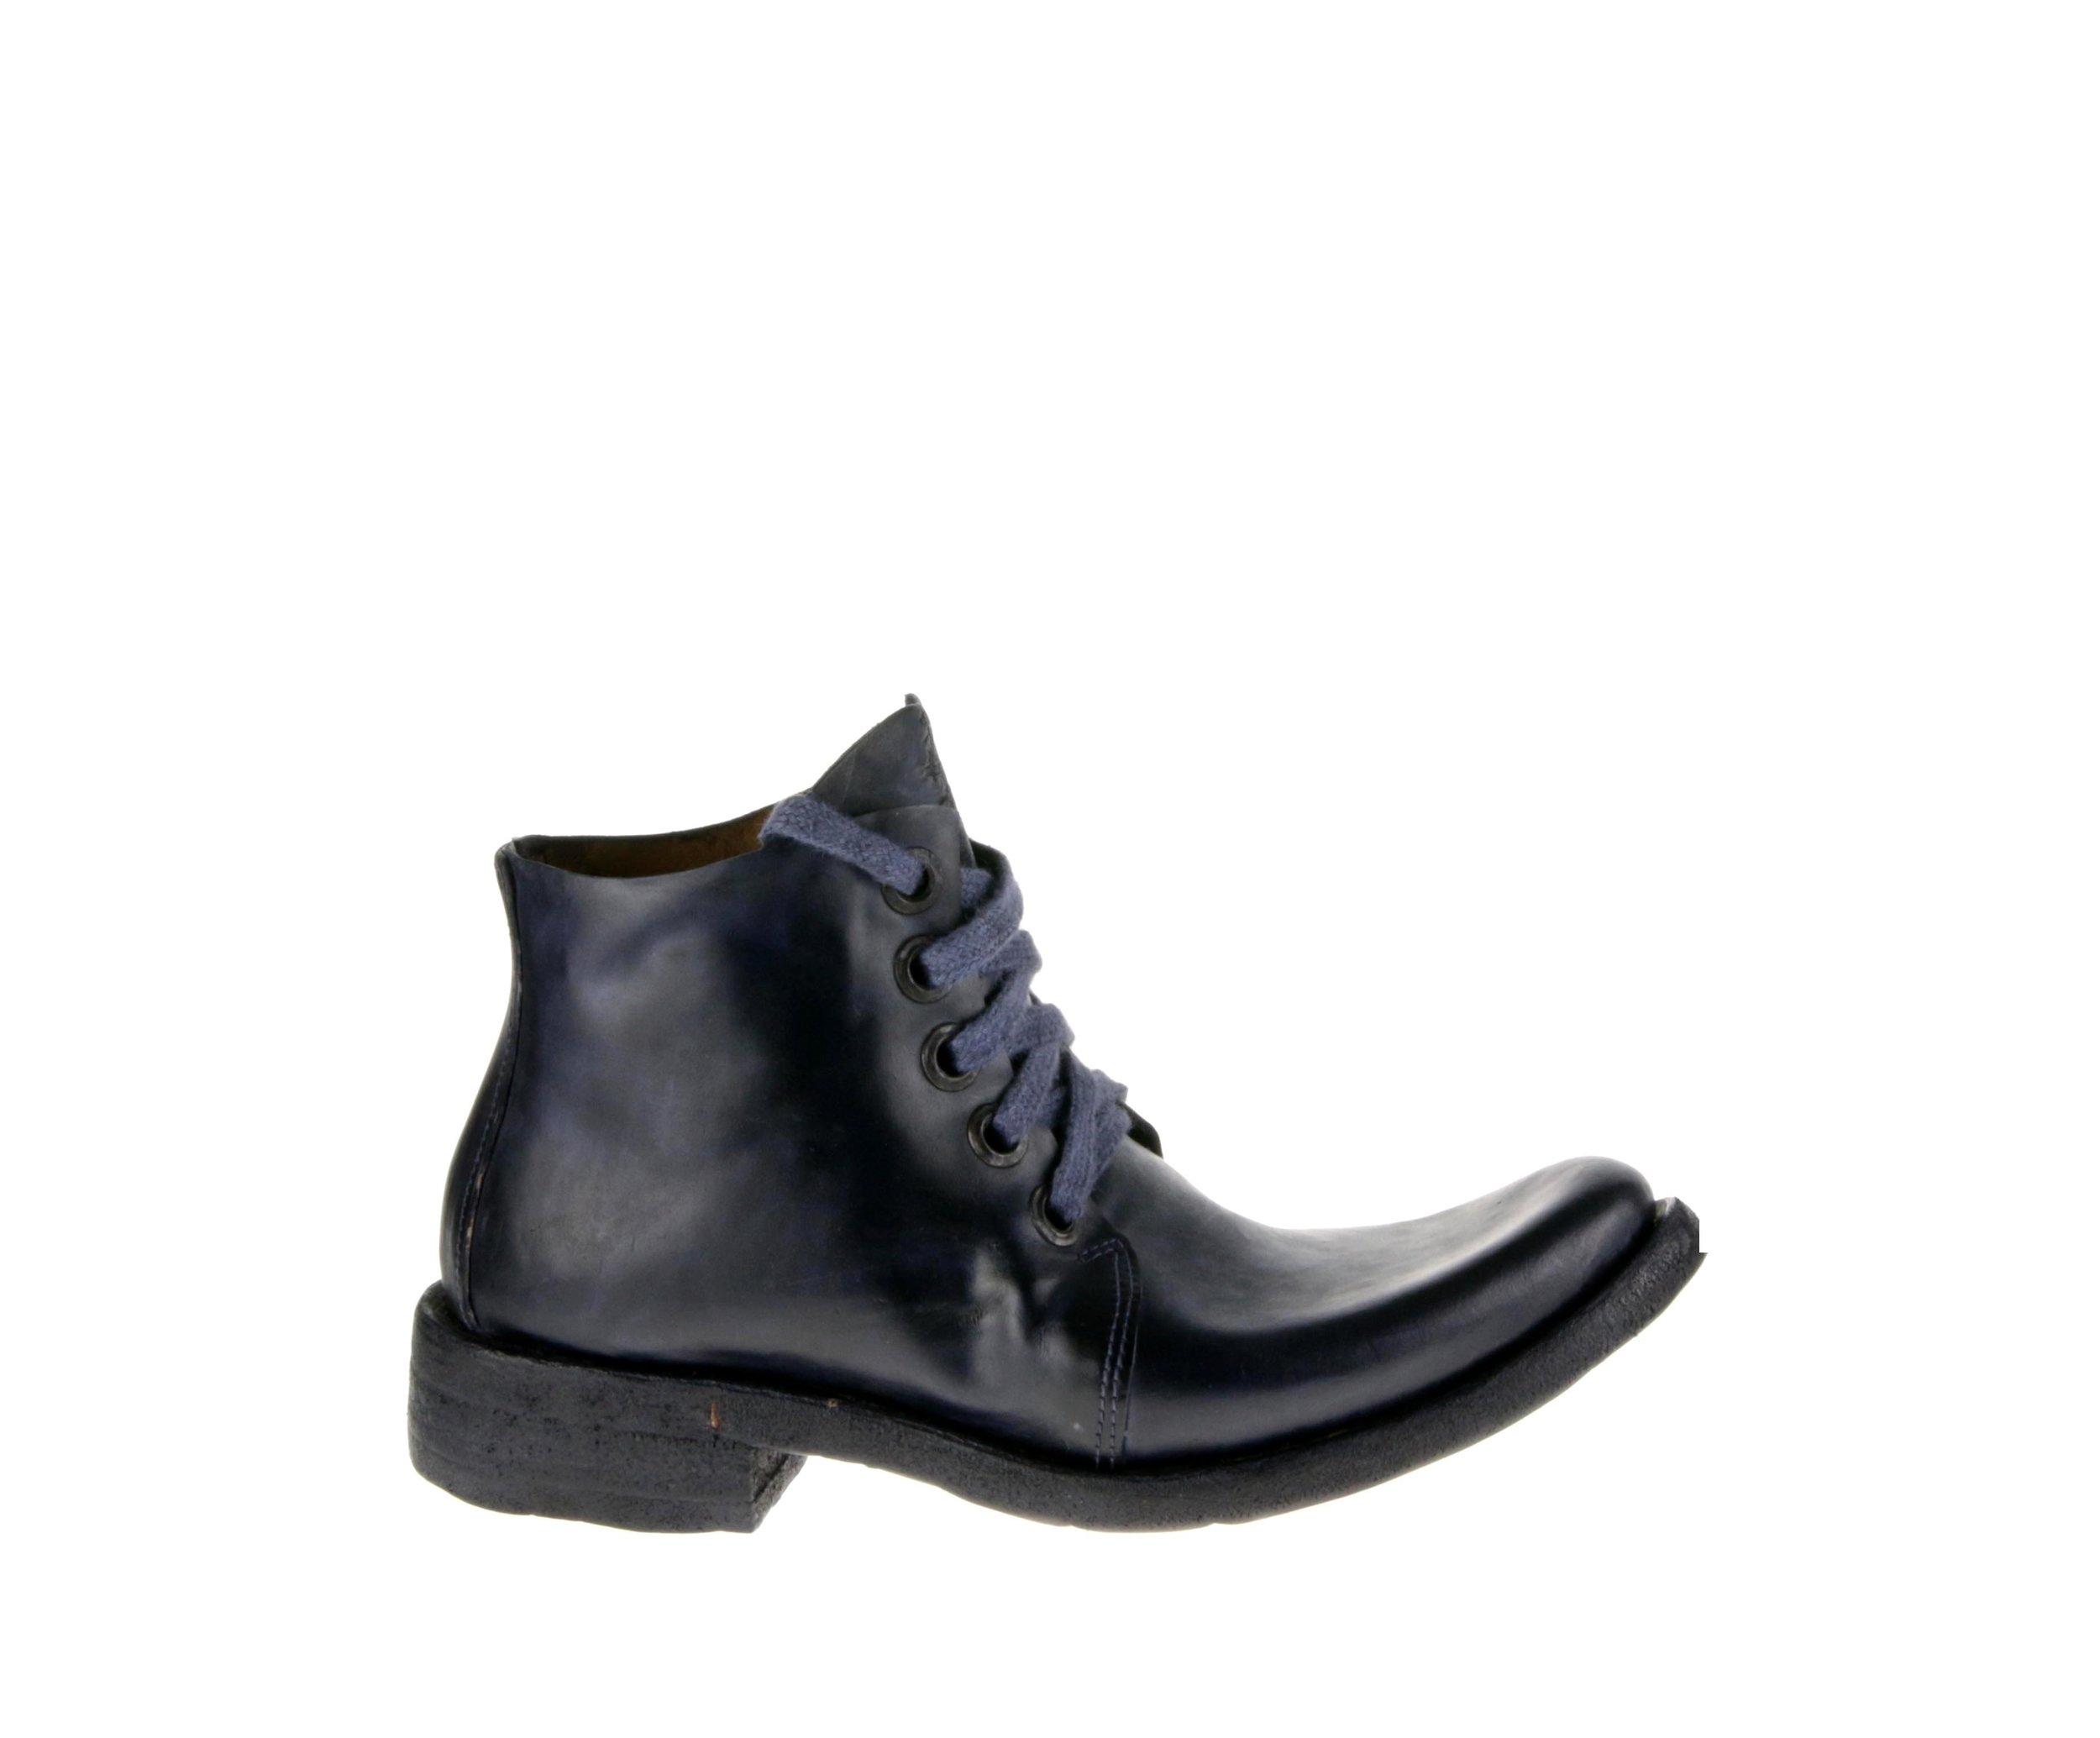 5Hole Boot Cordovan Navy Blue